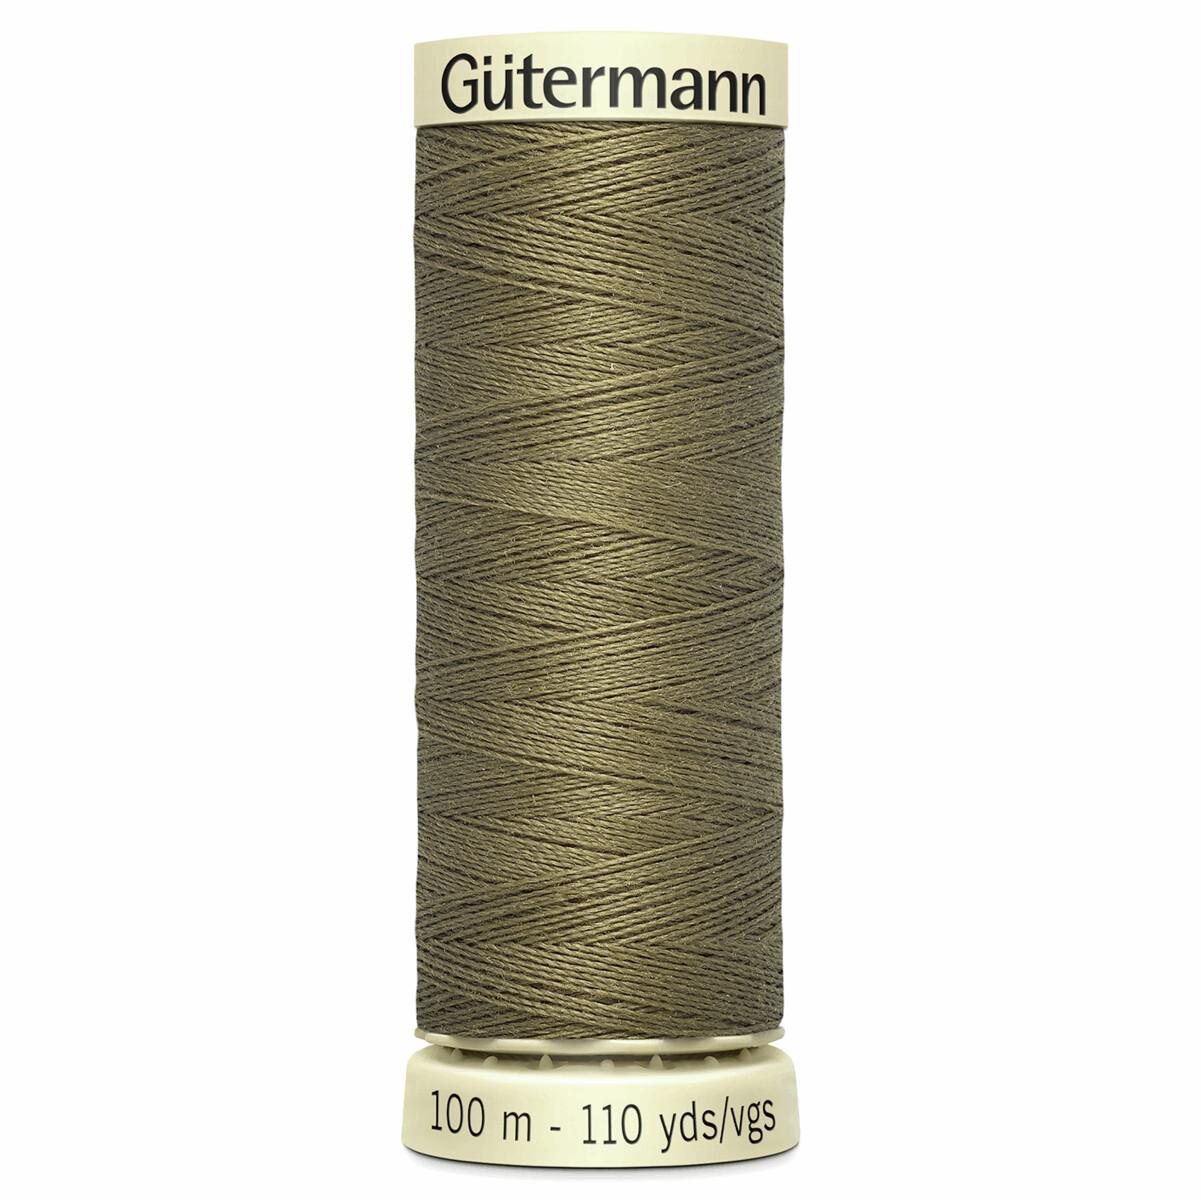 Gutermann Sew-All thread 528